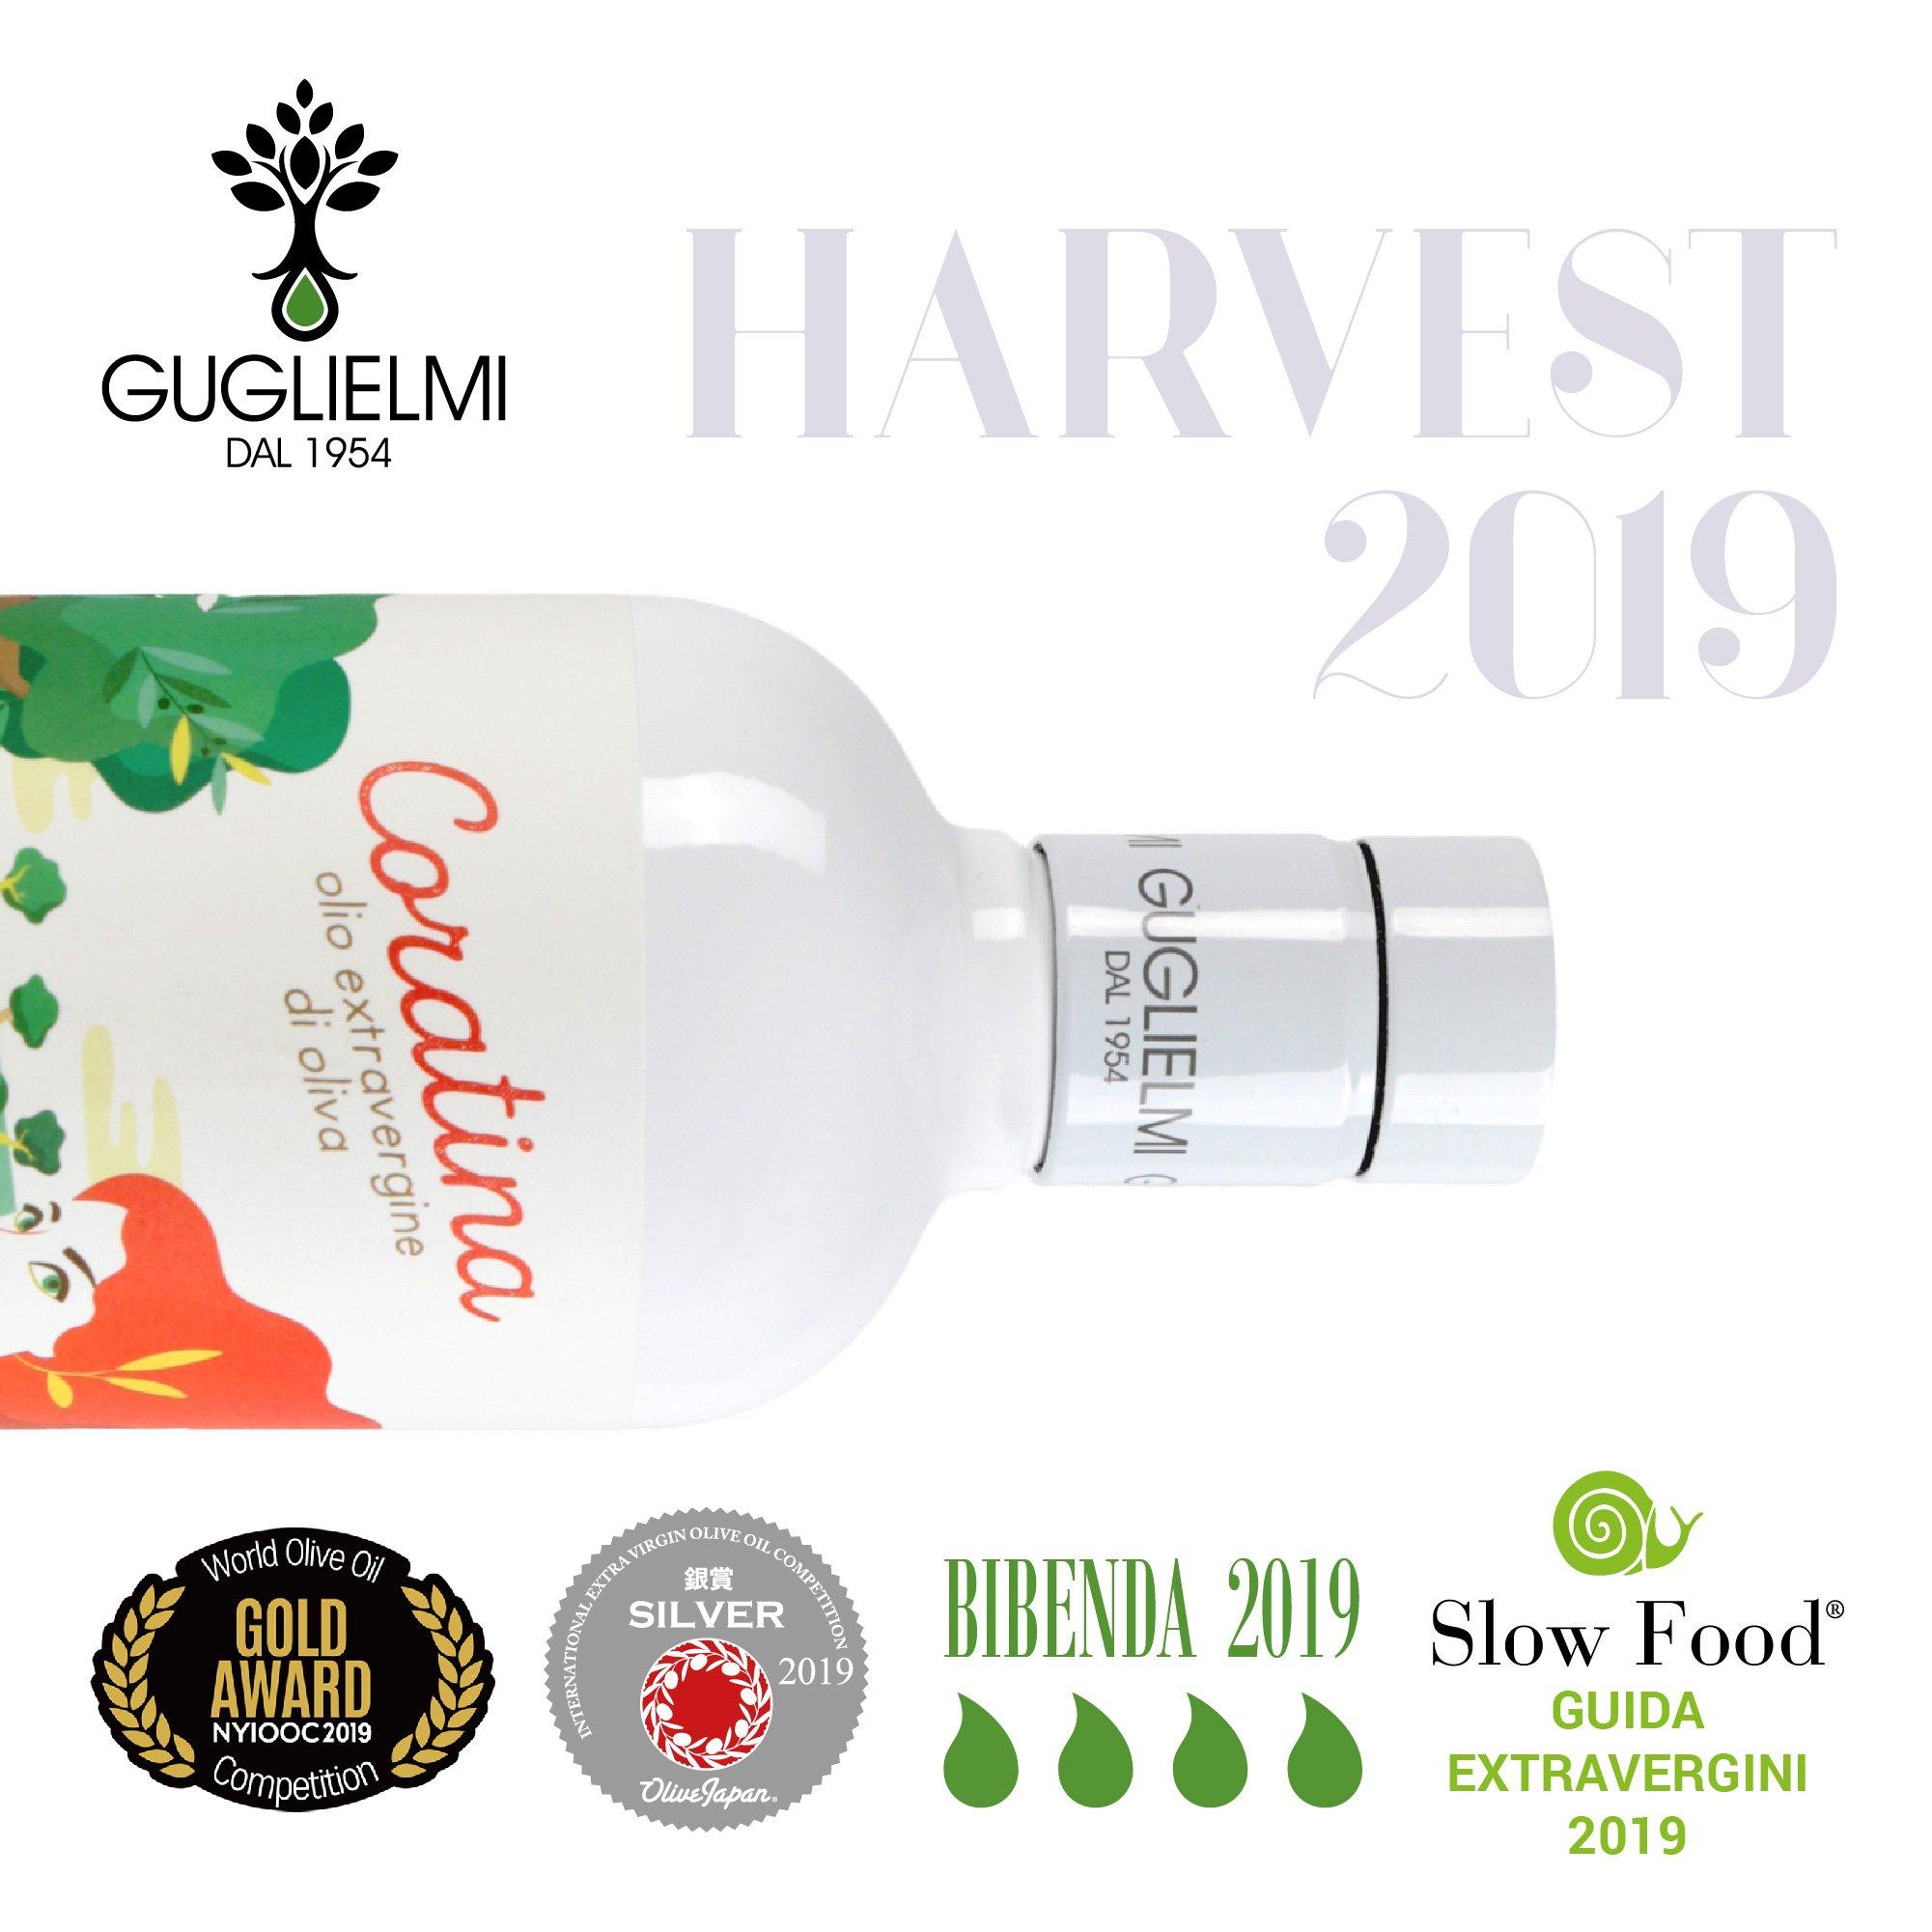 monocultivar coratina premi 2019 olio guglielmi